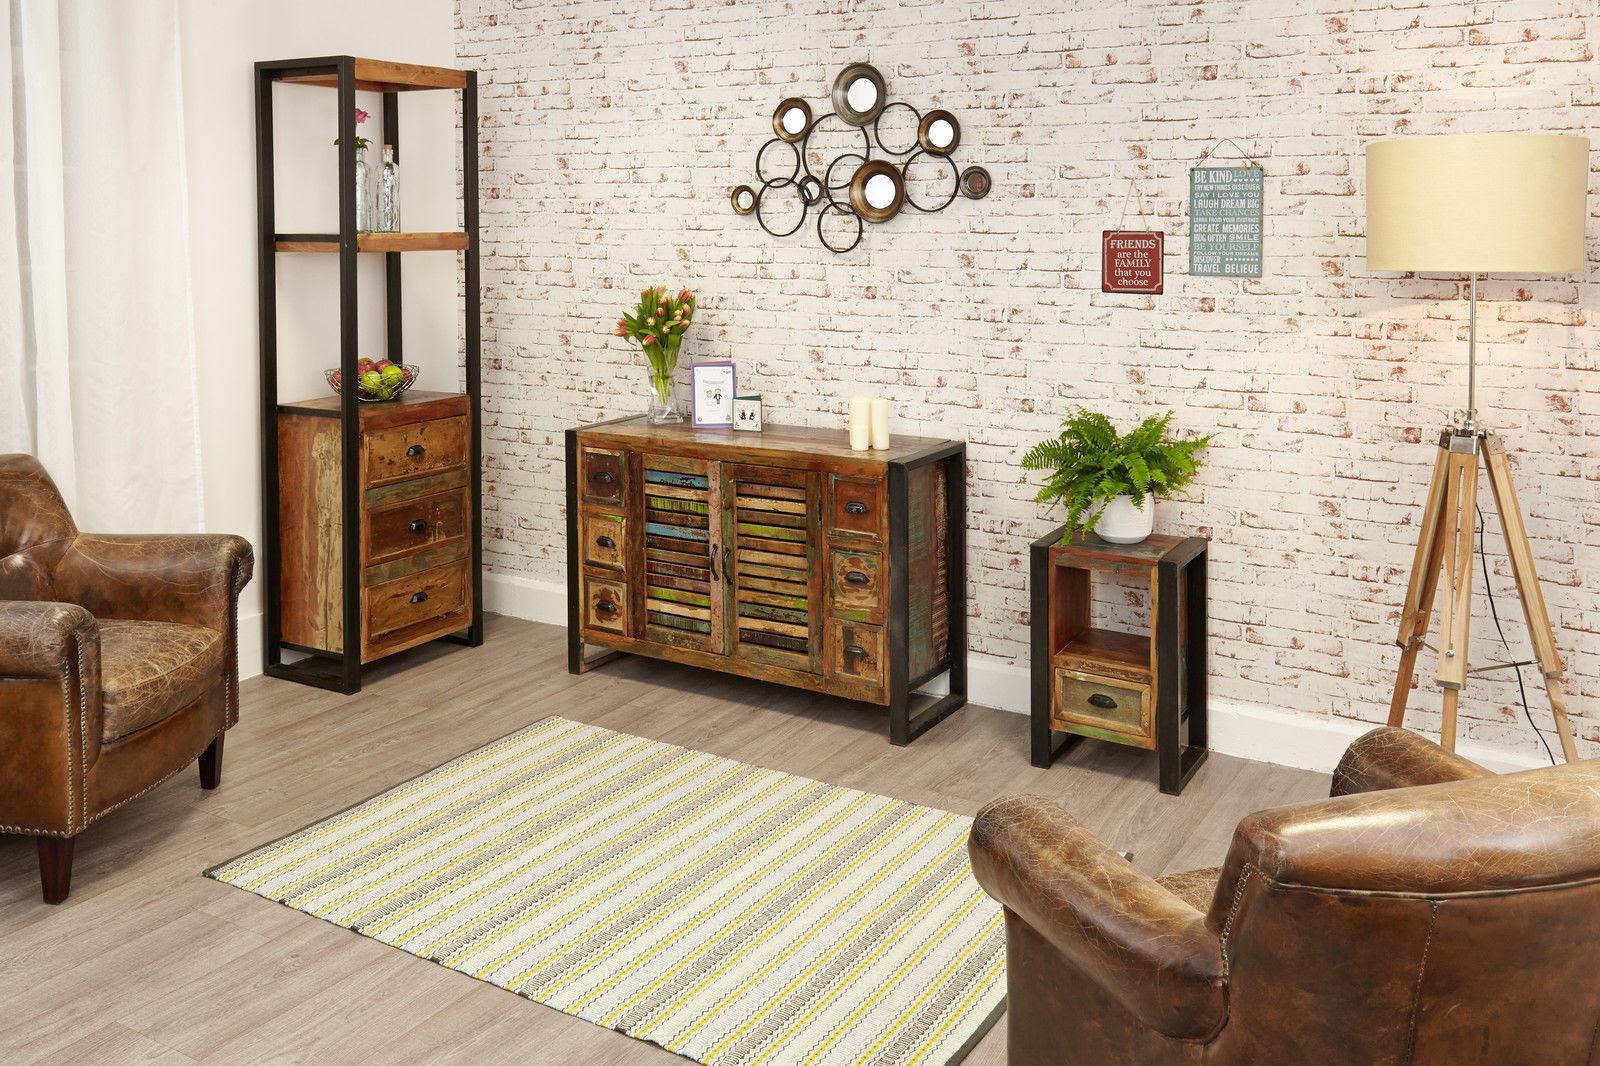 New Baumhaus Urban Chic Furniture Range - Contemporary ...